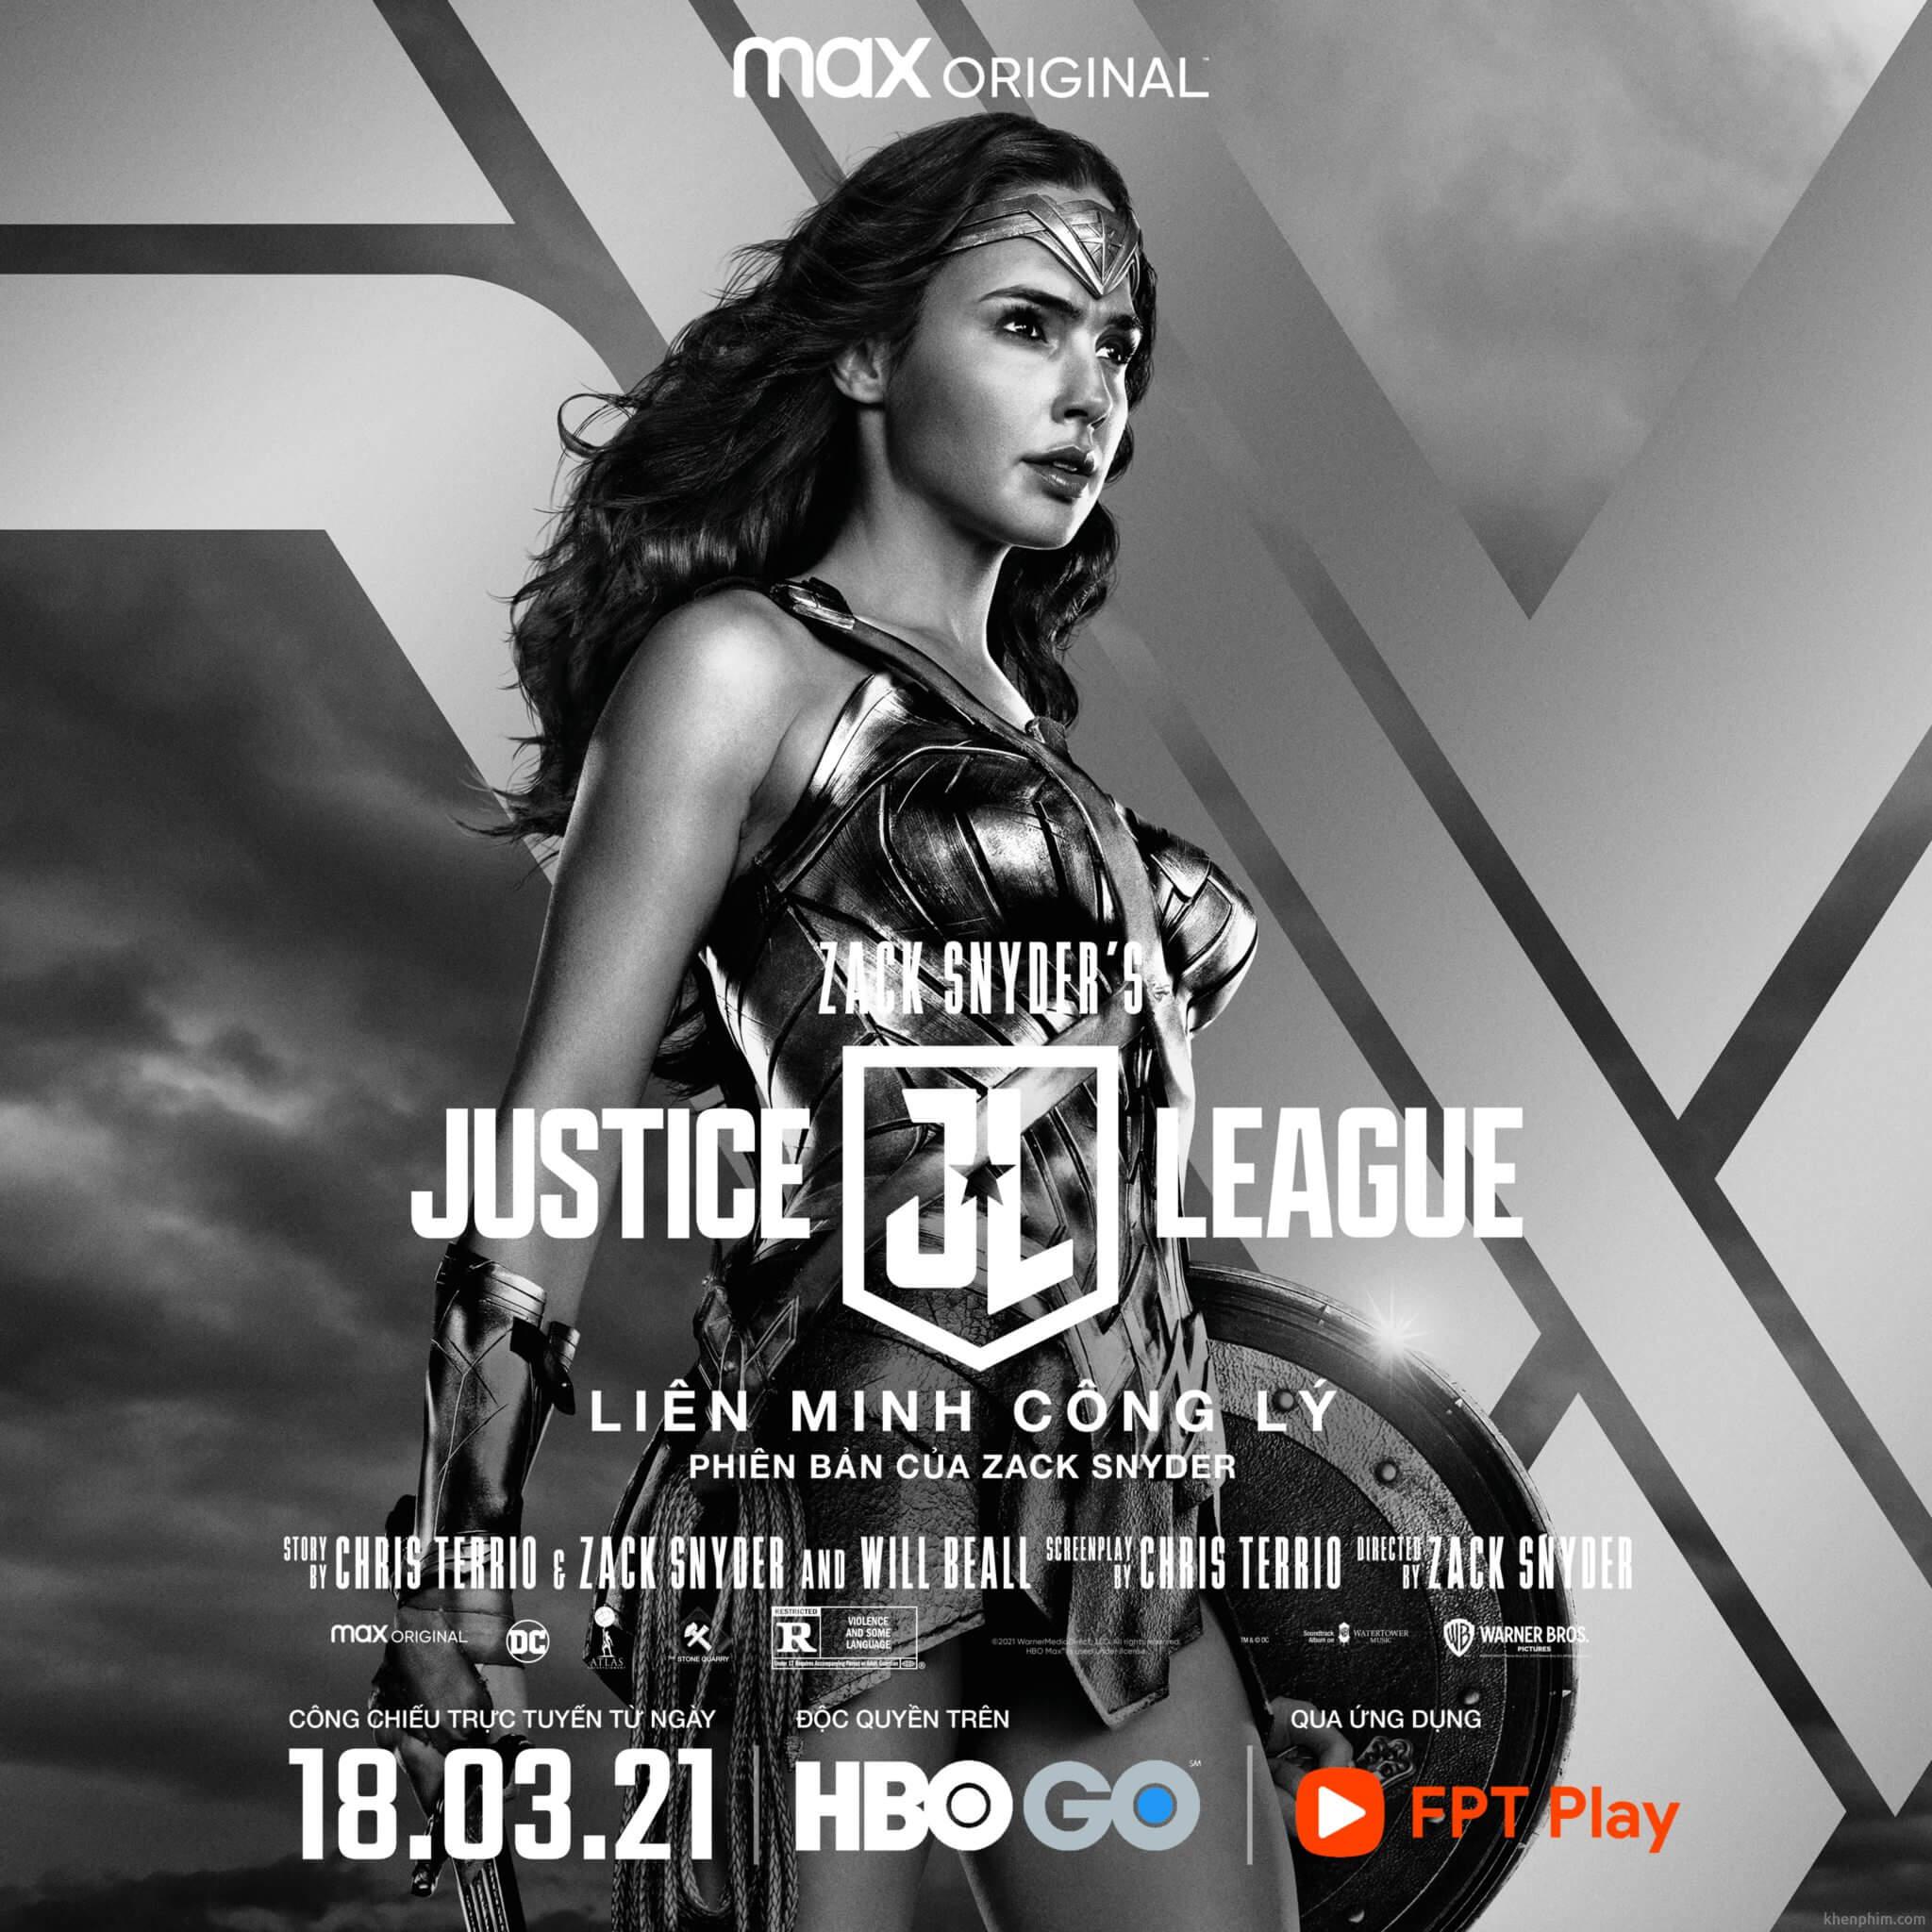 Poster nhân vật trong phim Zack Snyder's Justice League - Wonder Woman